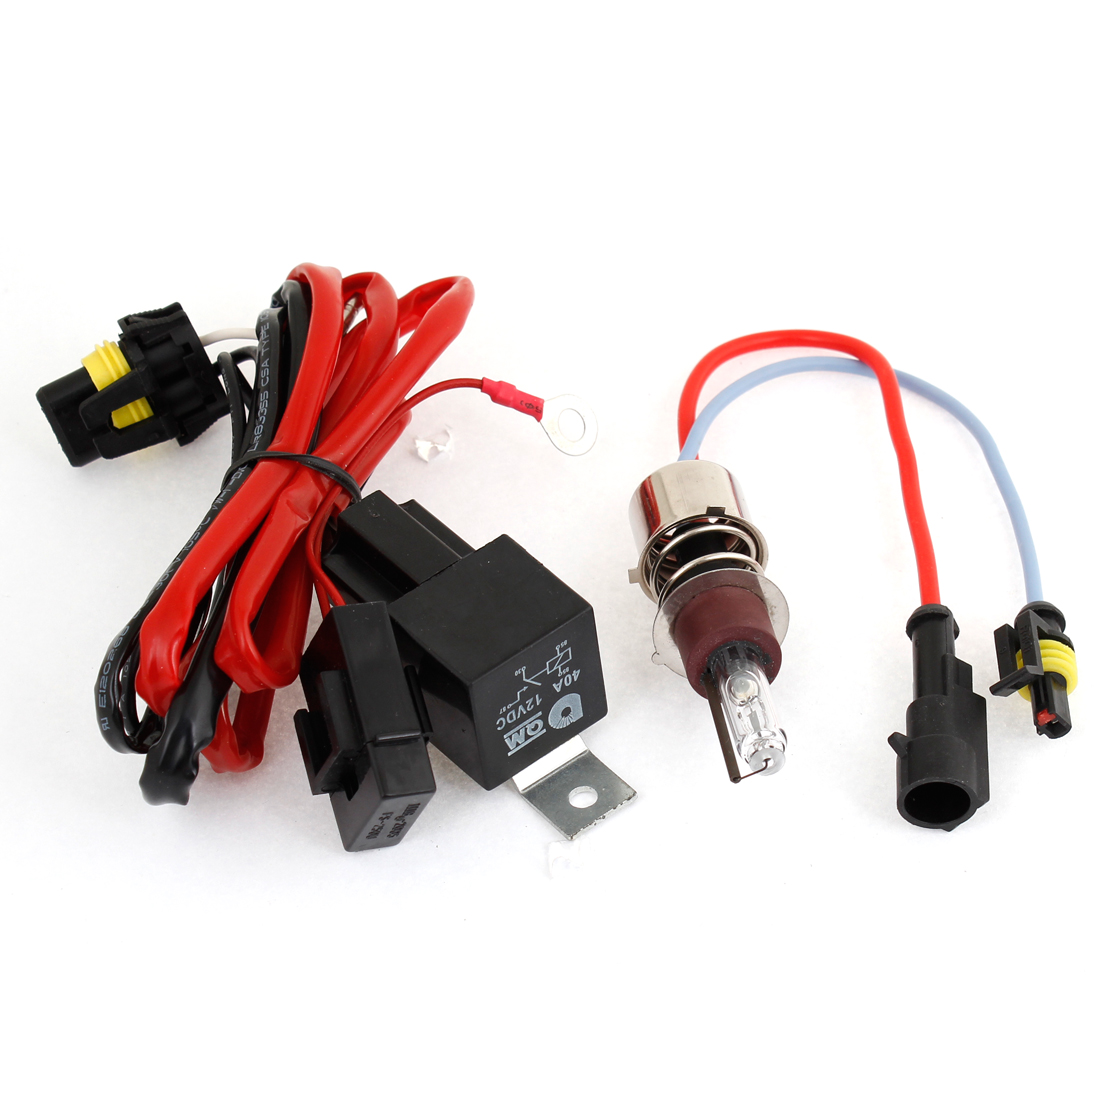 Car 25W 4300K Xenon HID H6 Headlight Bulb w Wiring Harness Controller